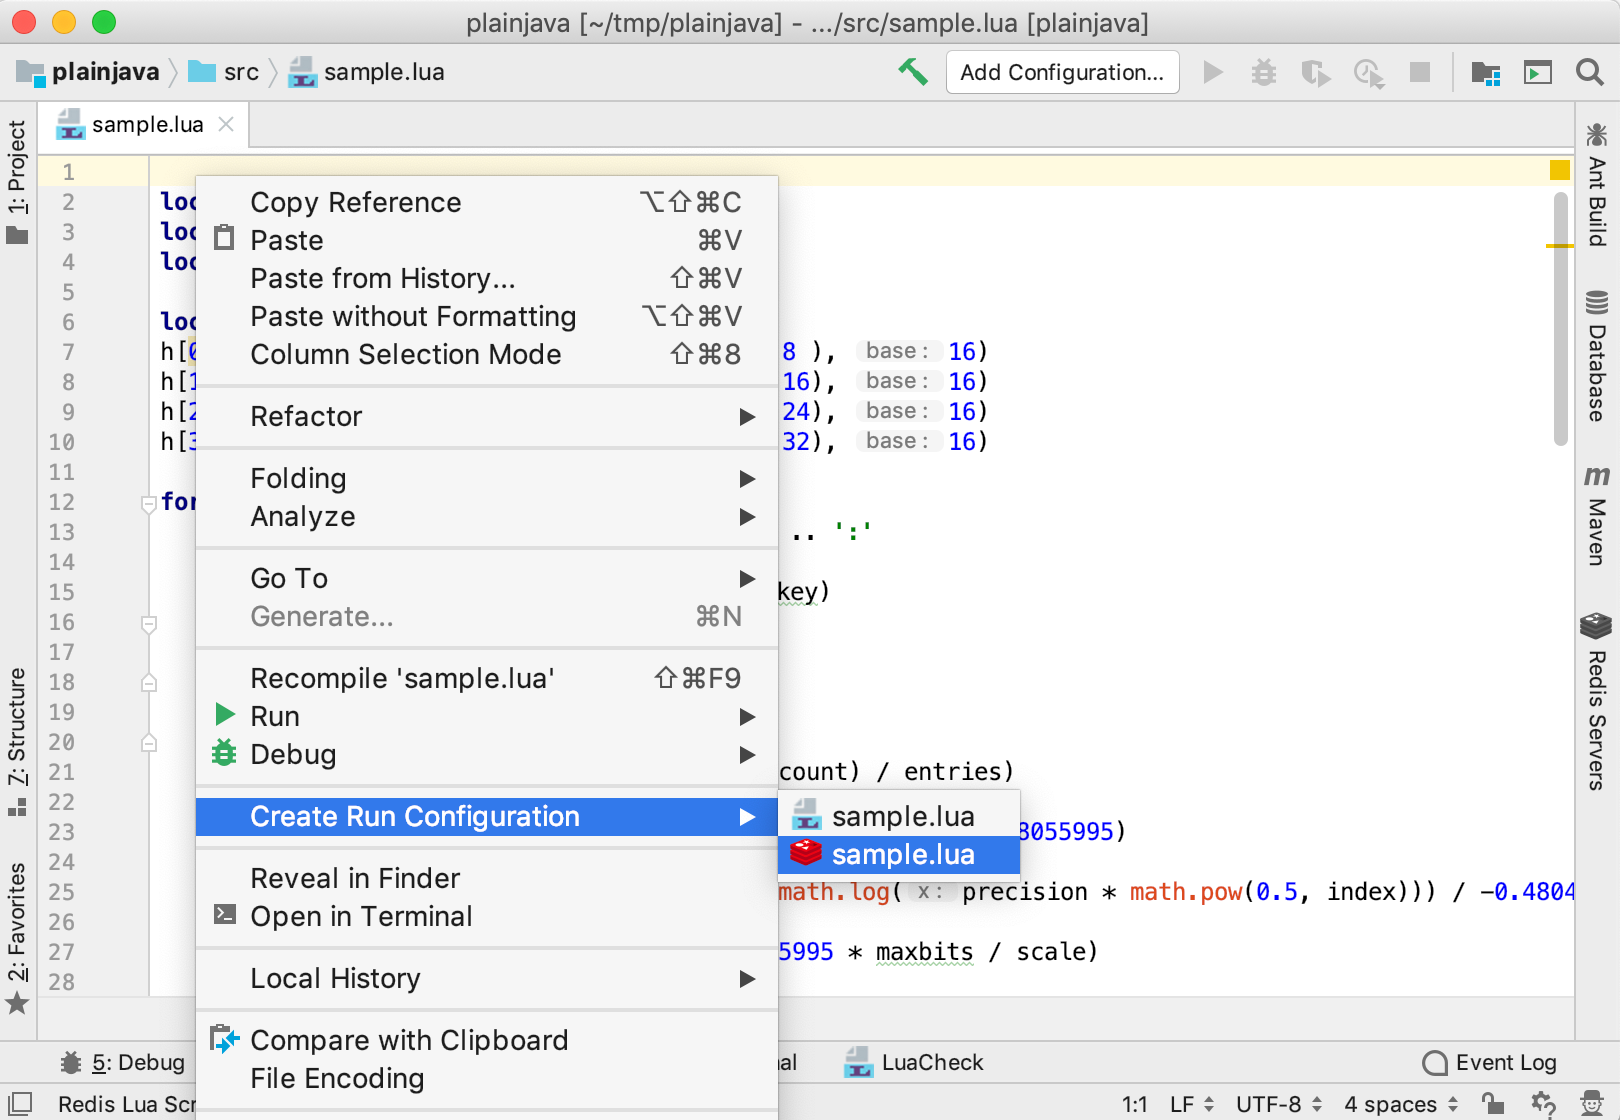 create run configuration2